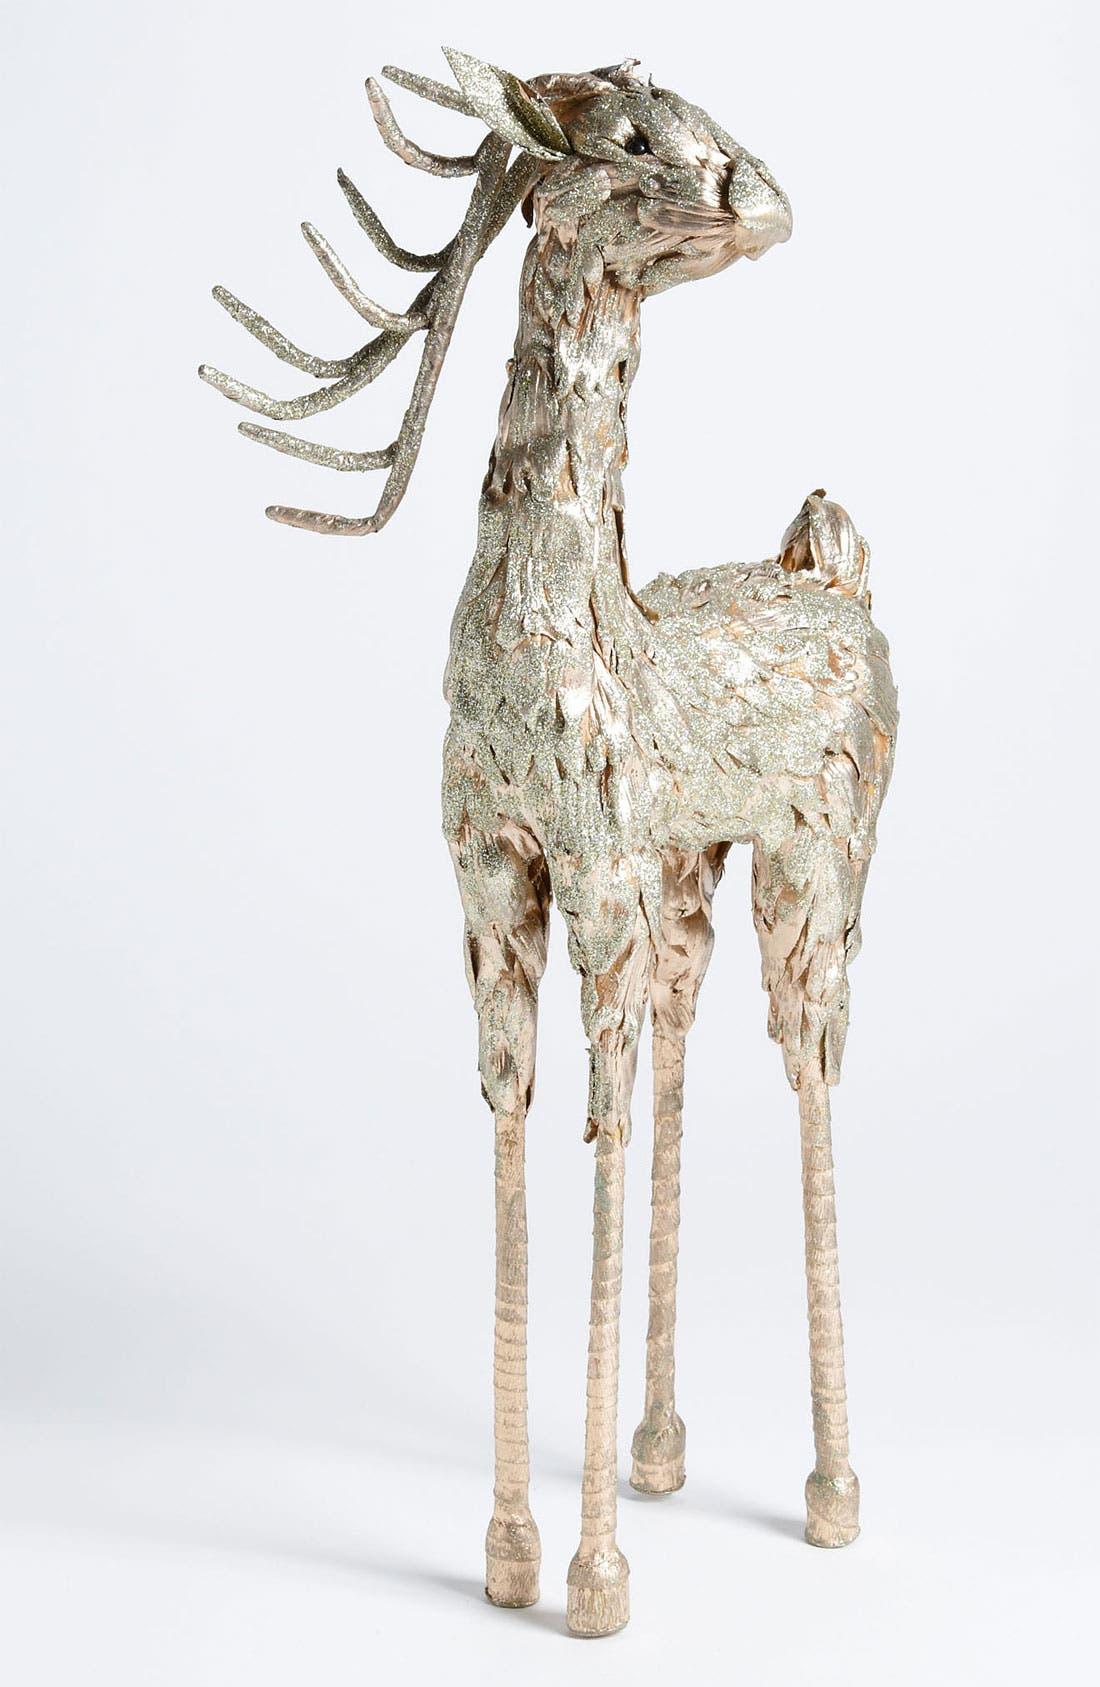 Main Image - Jim Marvin 'Standing Reindeer' Figurine